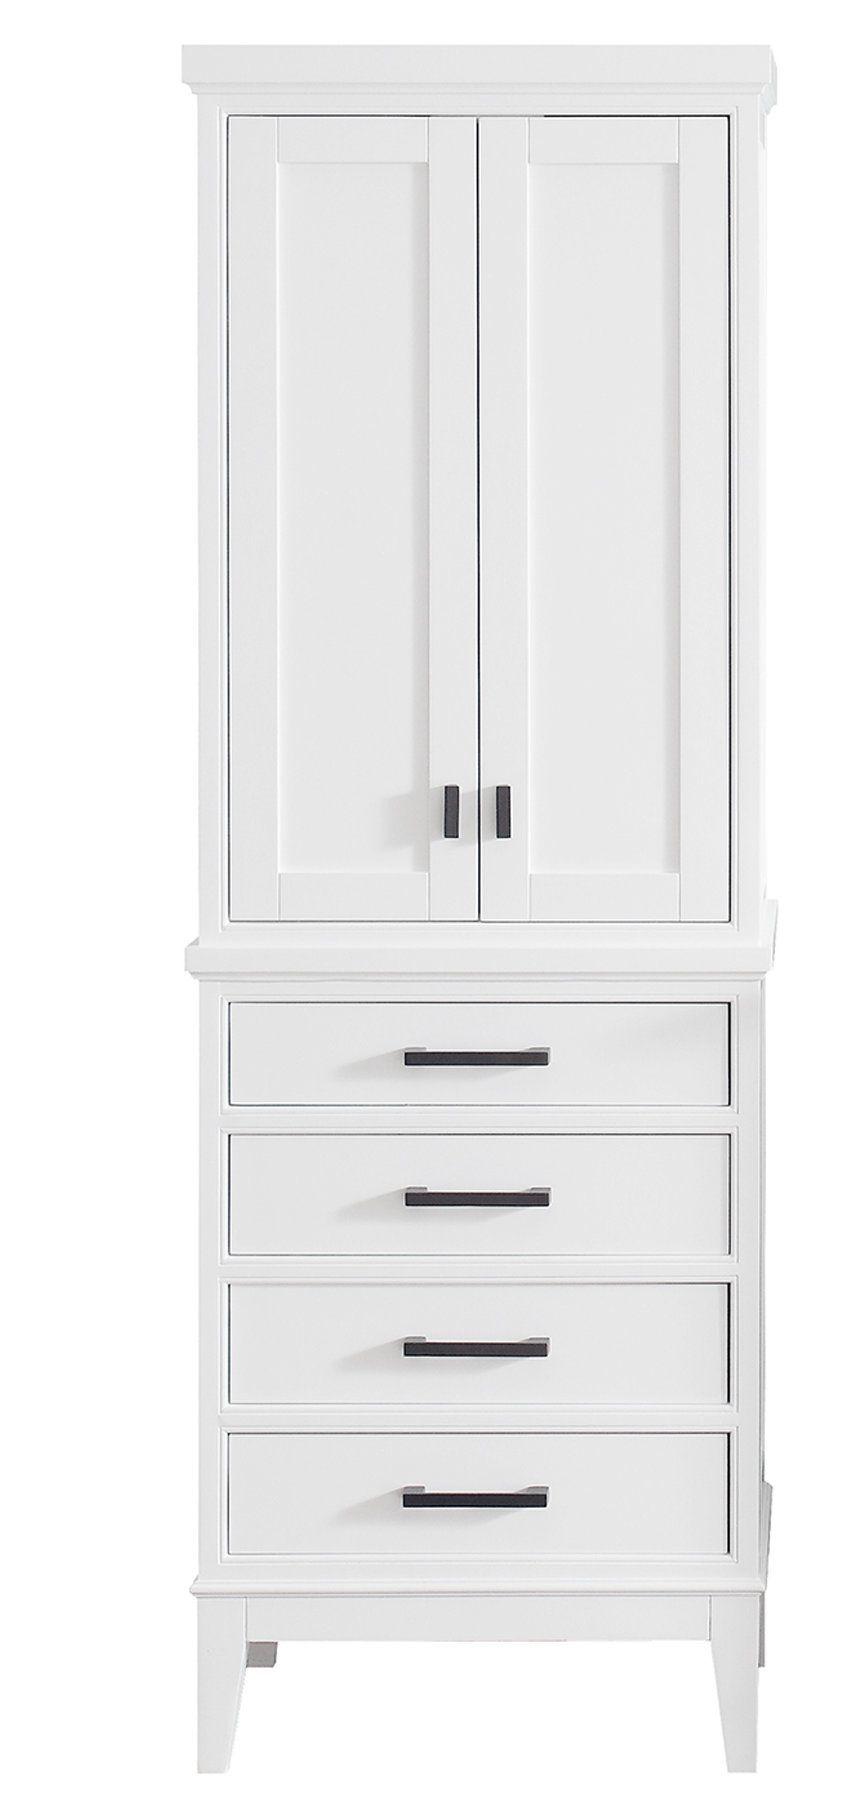 Bertha Linen Tower Linencloset Bathroom Freestanding Freestanding Bathroom Cabinet Tall Cabinet Storage